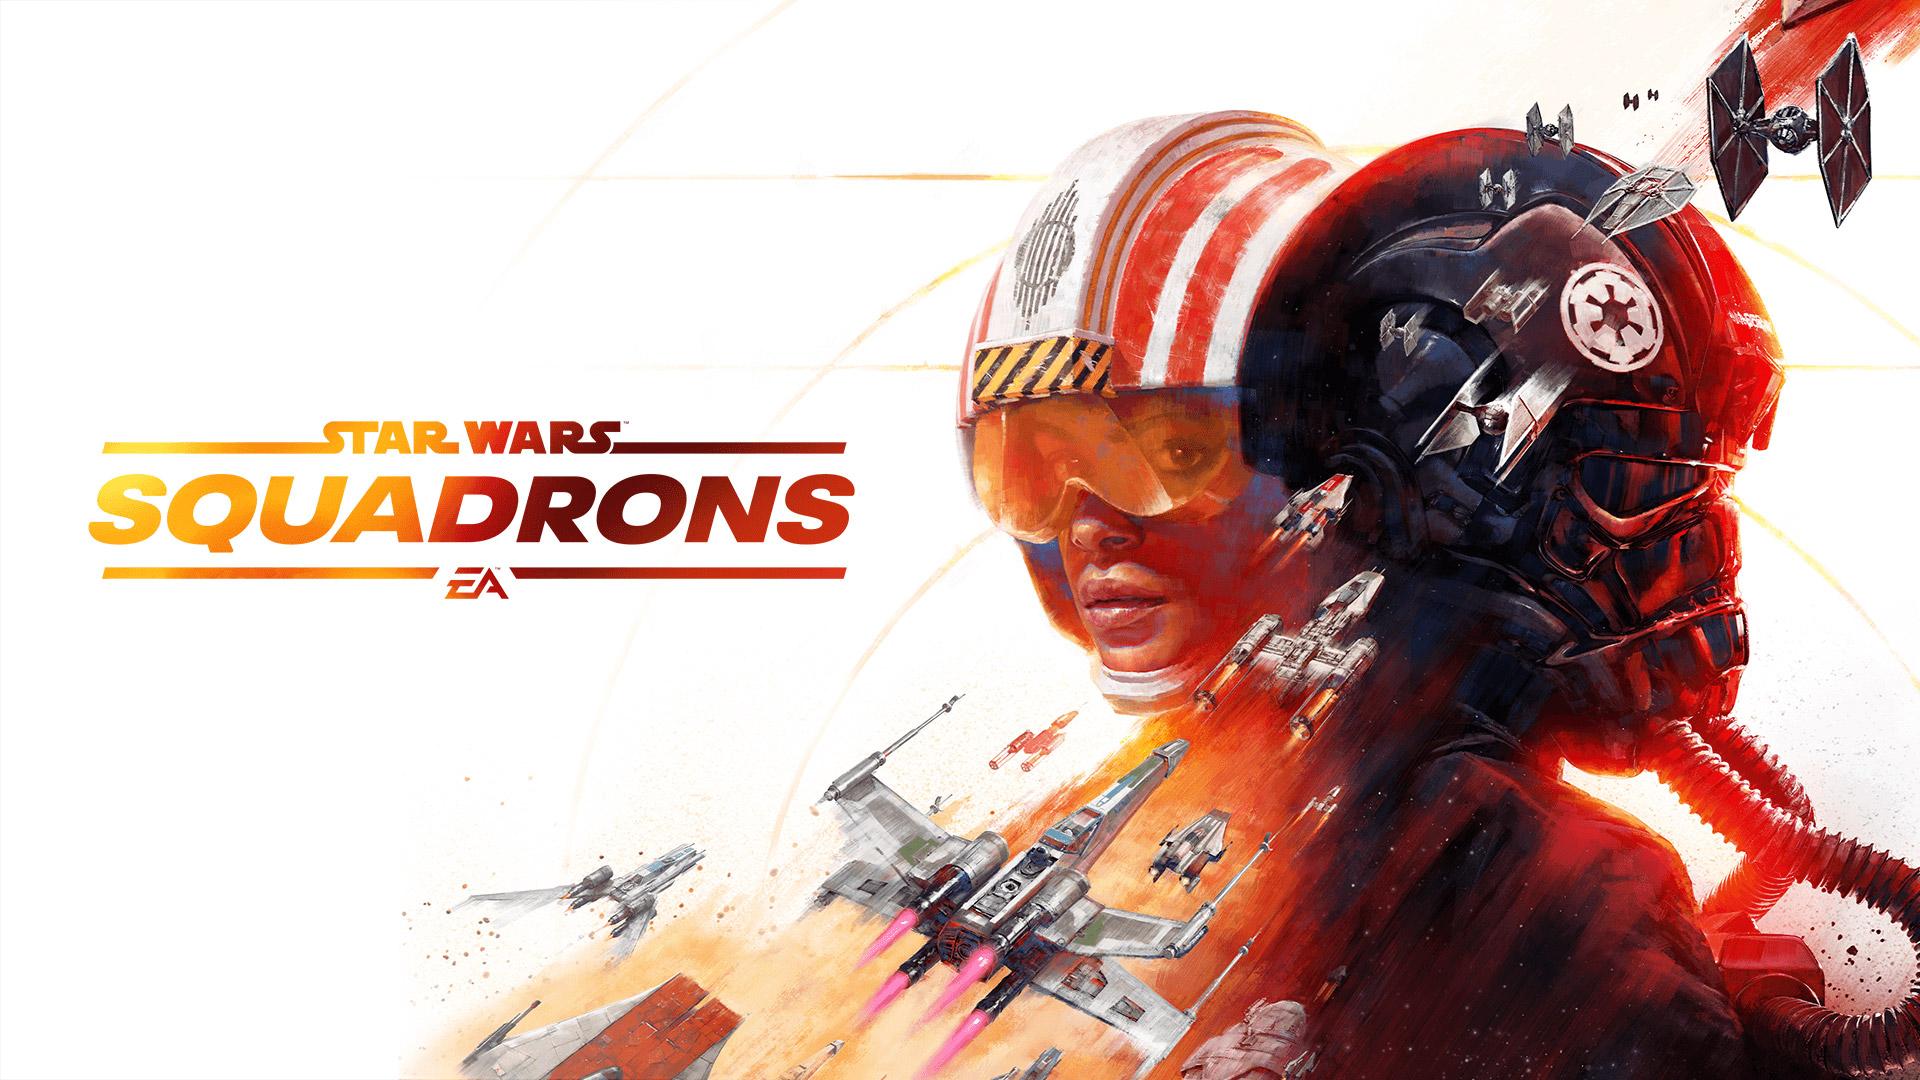 Free Star Wars: Squadrons Wallpaper in 1920x1080